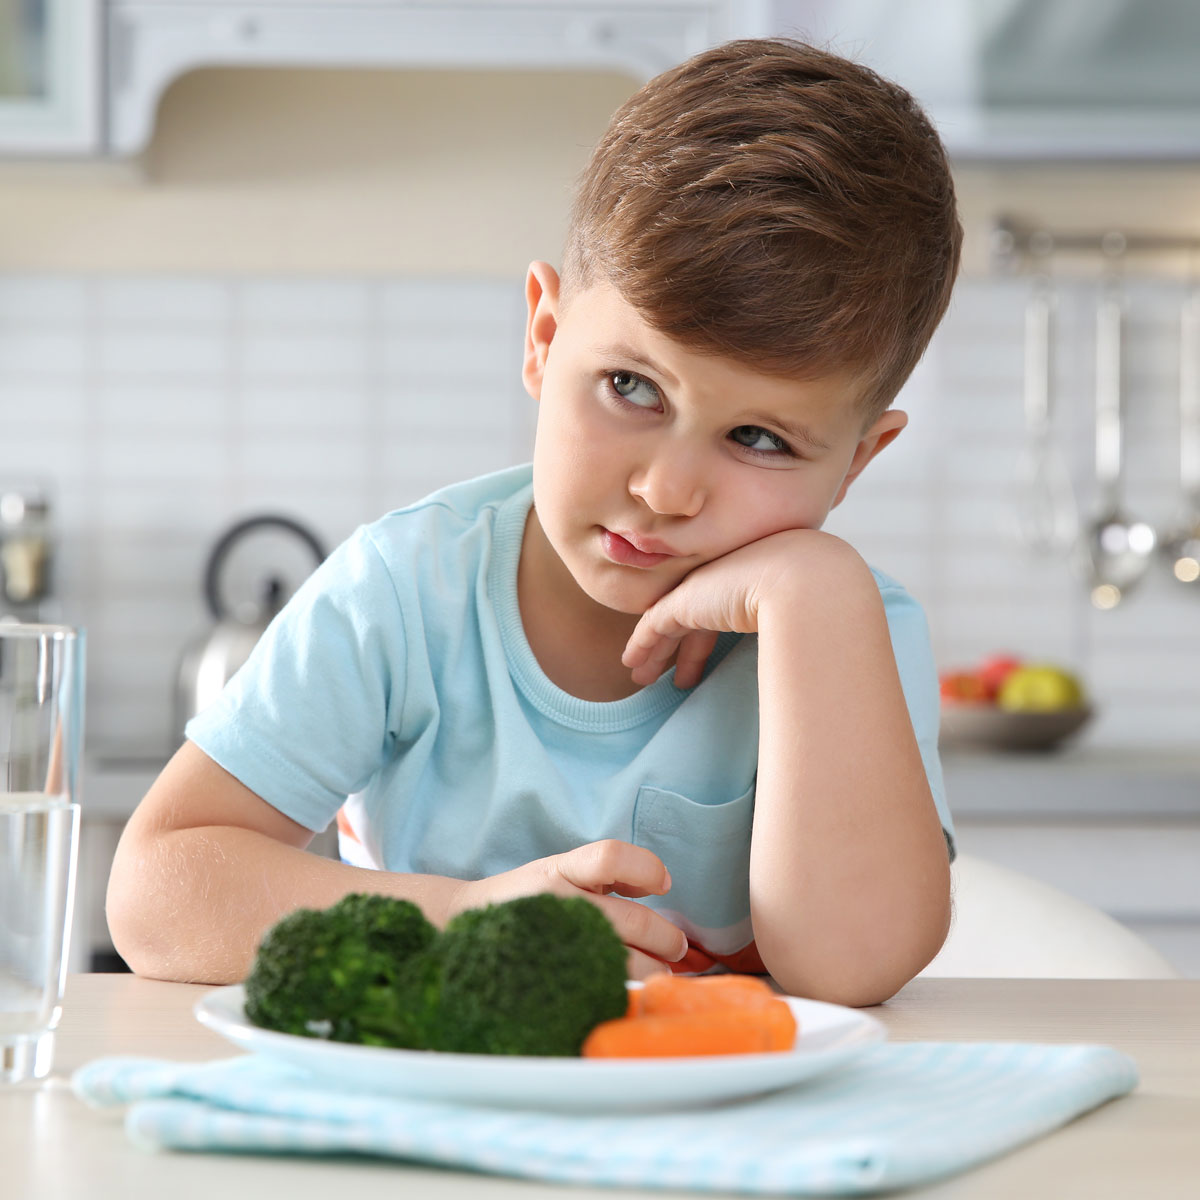 Kind-vegan-ernaehren